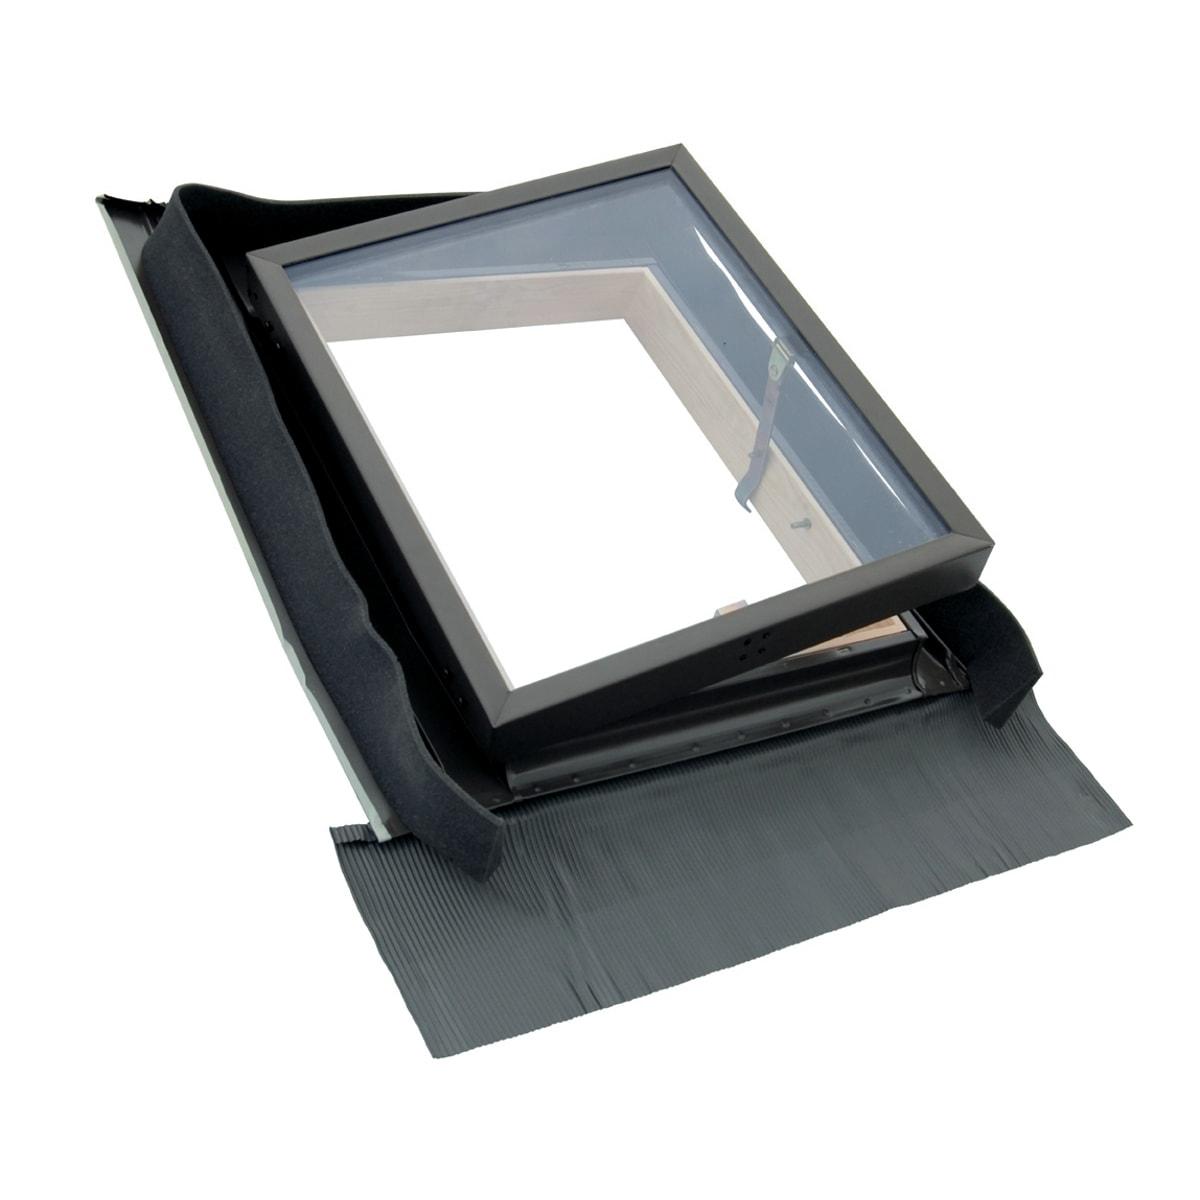 Finestra Oblò Leroy Merlin lucernario fe4555 manuale l 45 x h 55 cm marrone